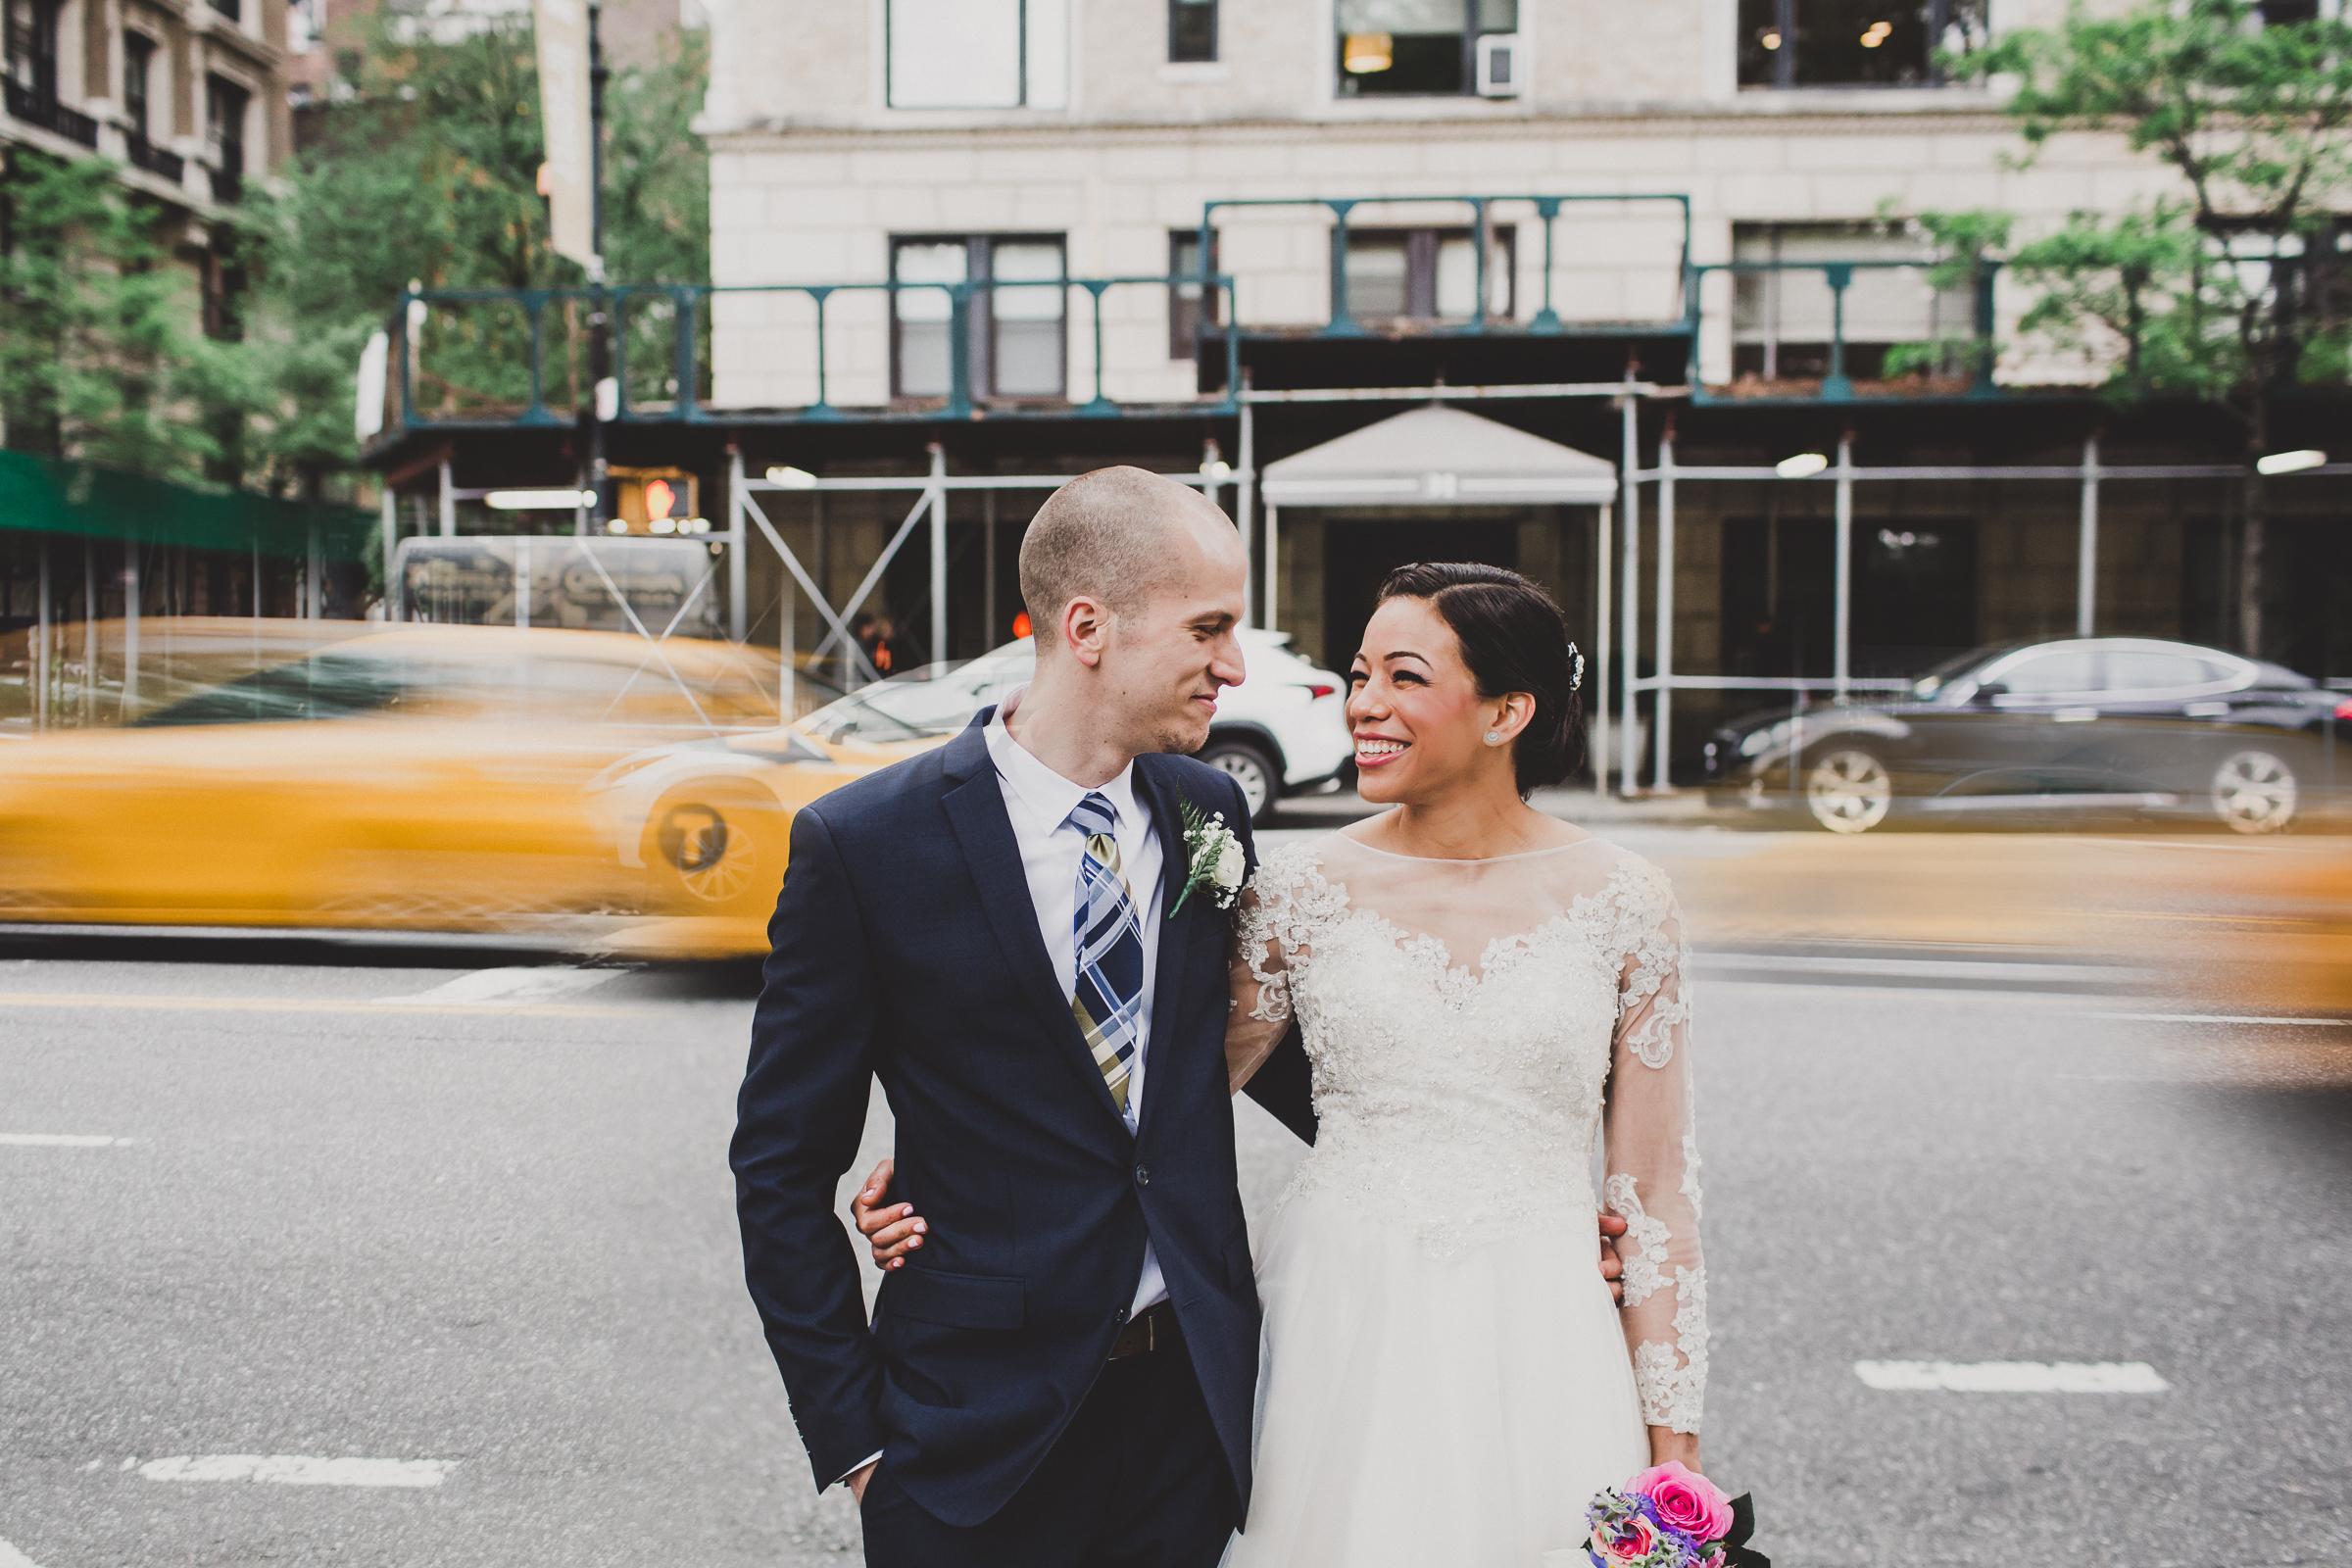 New-York-Documentary-Wedding-Photography-Best-Of-2017-by-Elvira-Kalviste-Photography-50.jpg